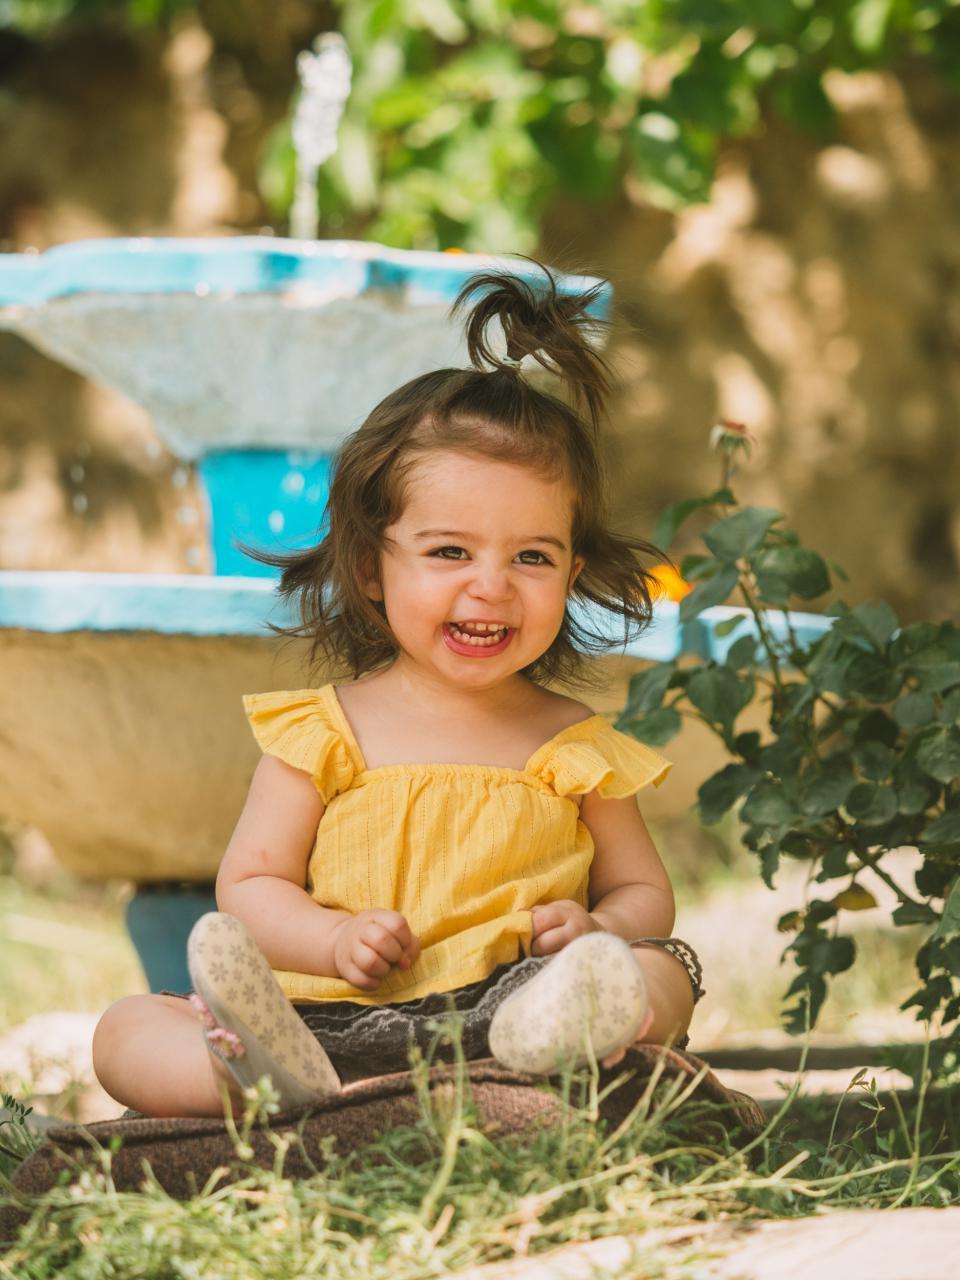 Children-Photography-10.jpg